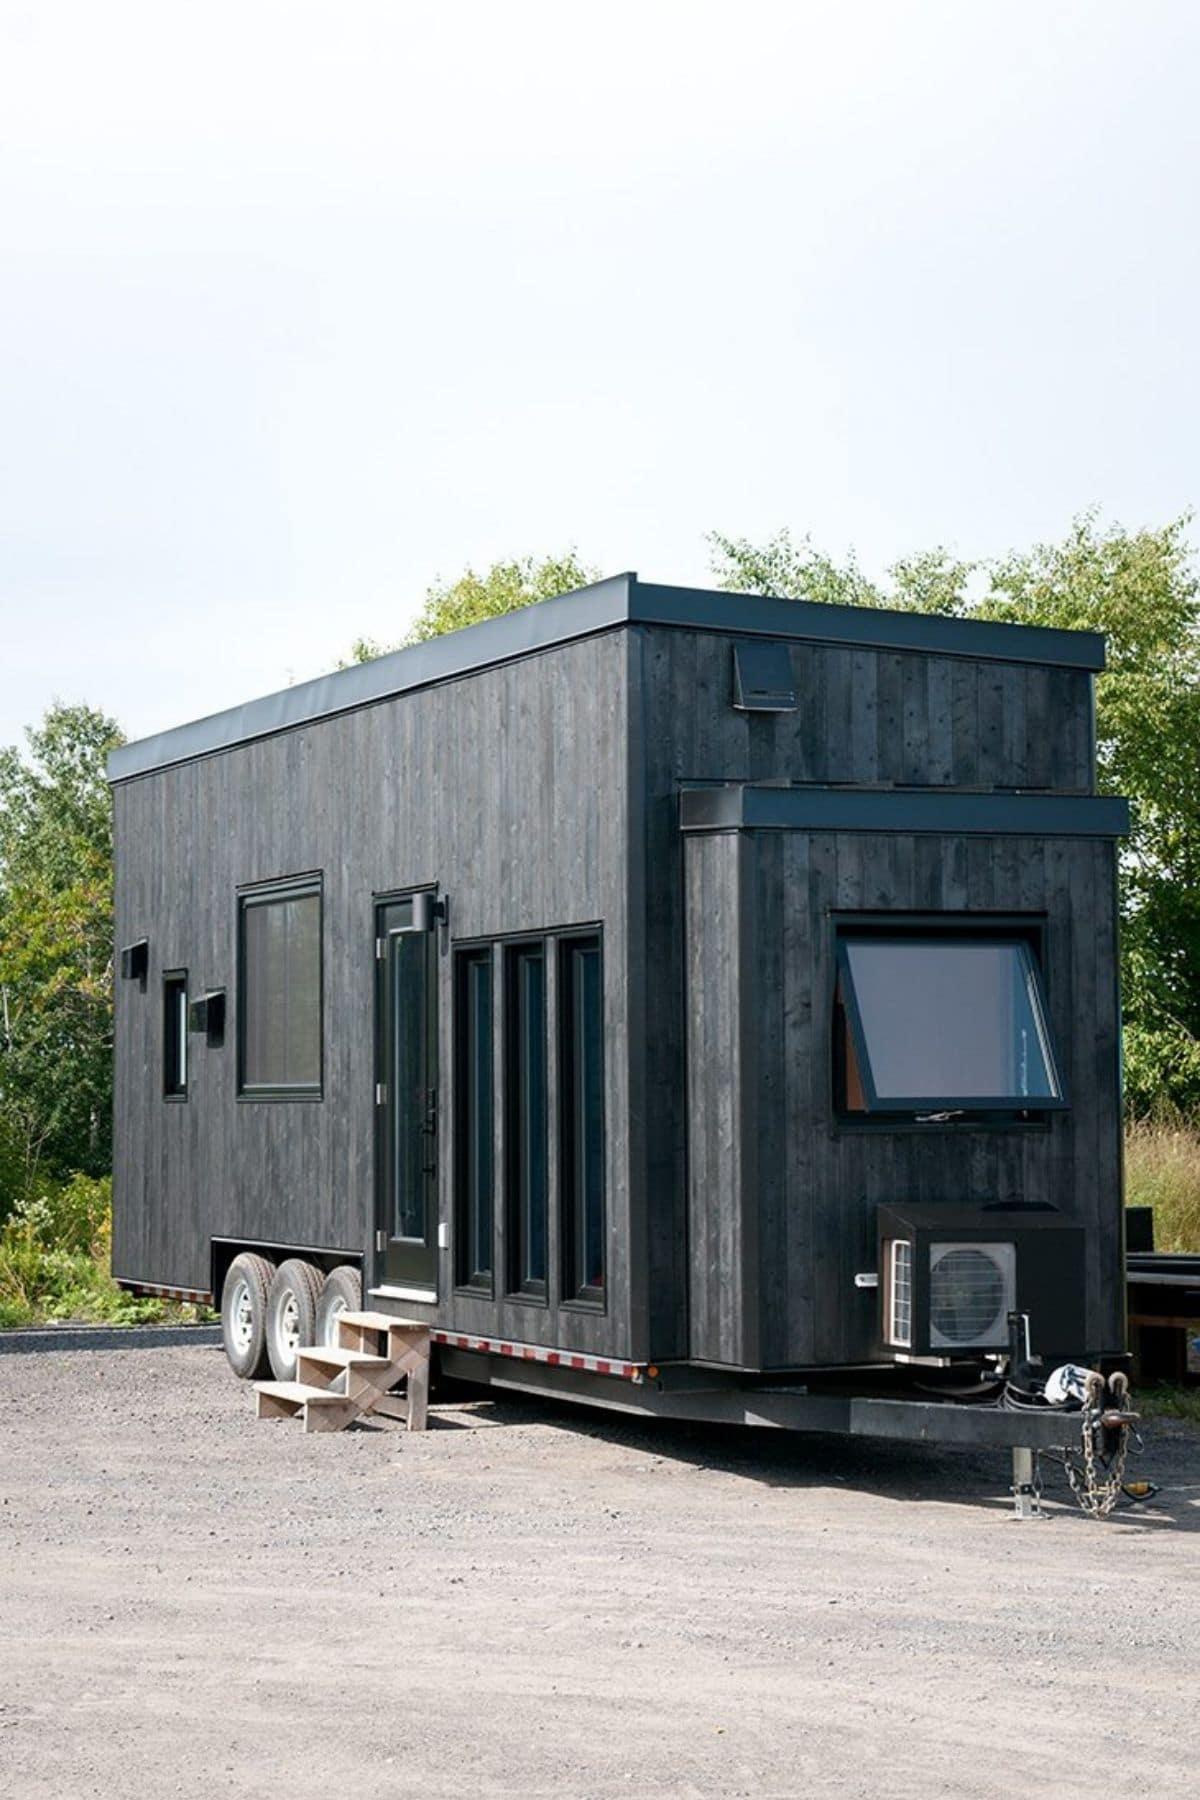 Dark gray siding on tiny home with three long windows on side